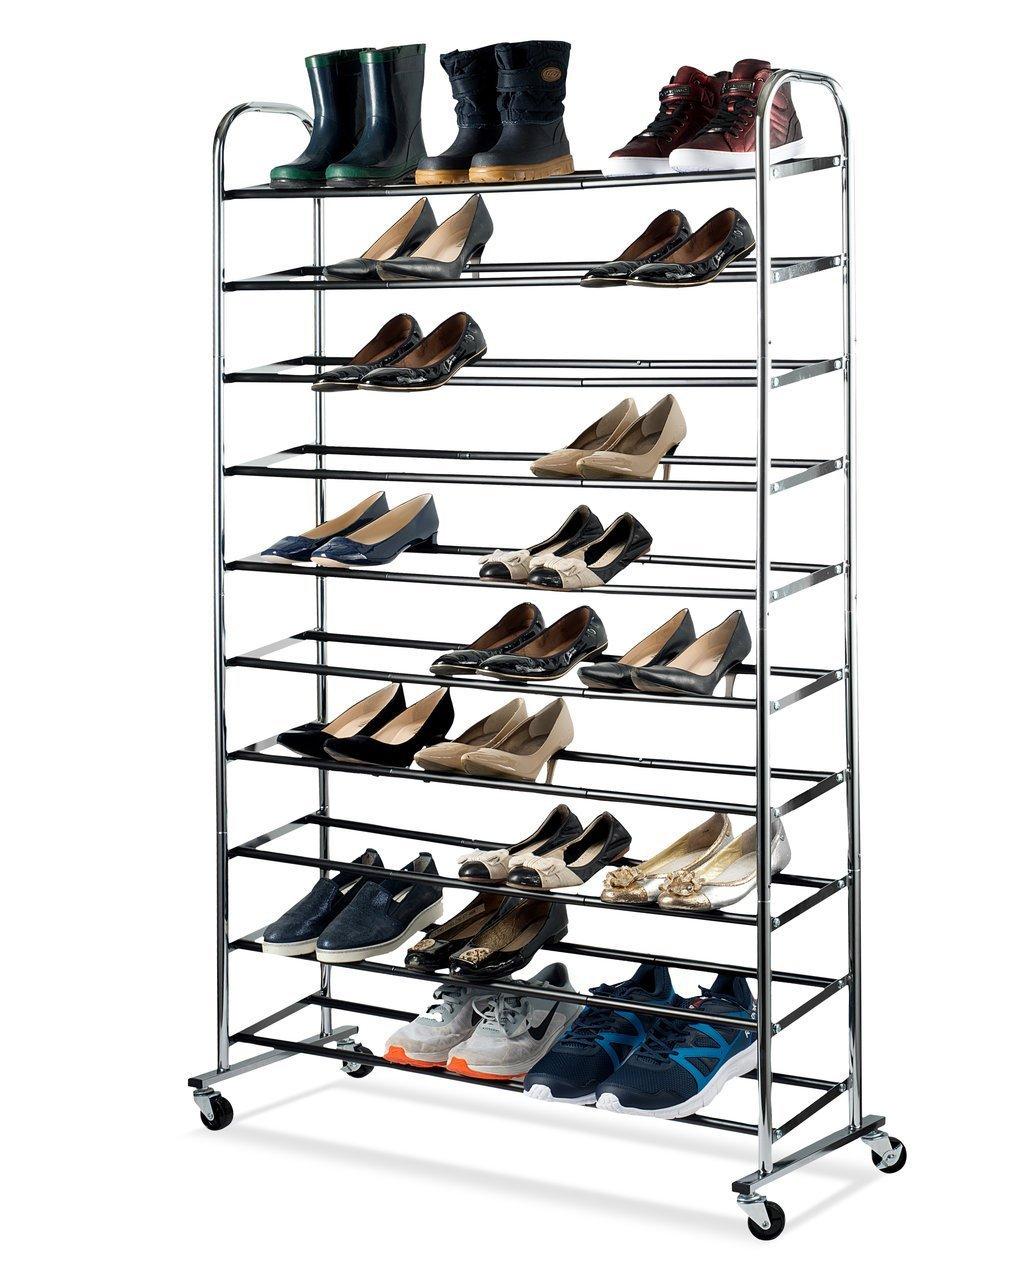 Shoe Organizer - Chrome Shoe Storage Supreme 50 Pair Shoe Rack Closet Shoe Organizer sagler